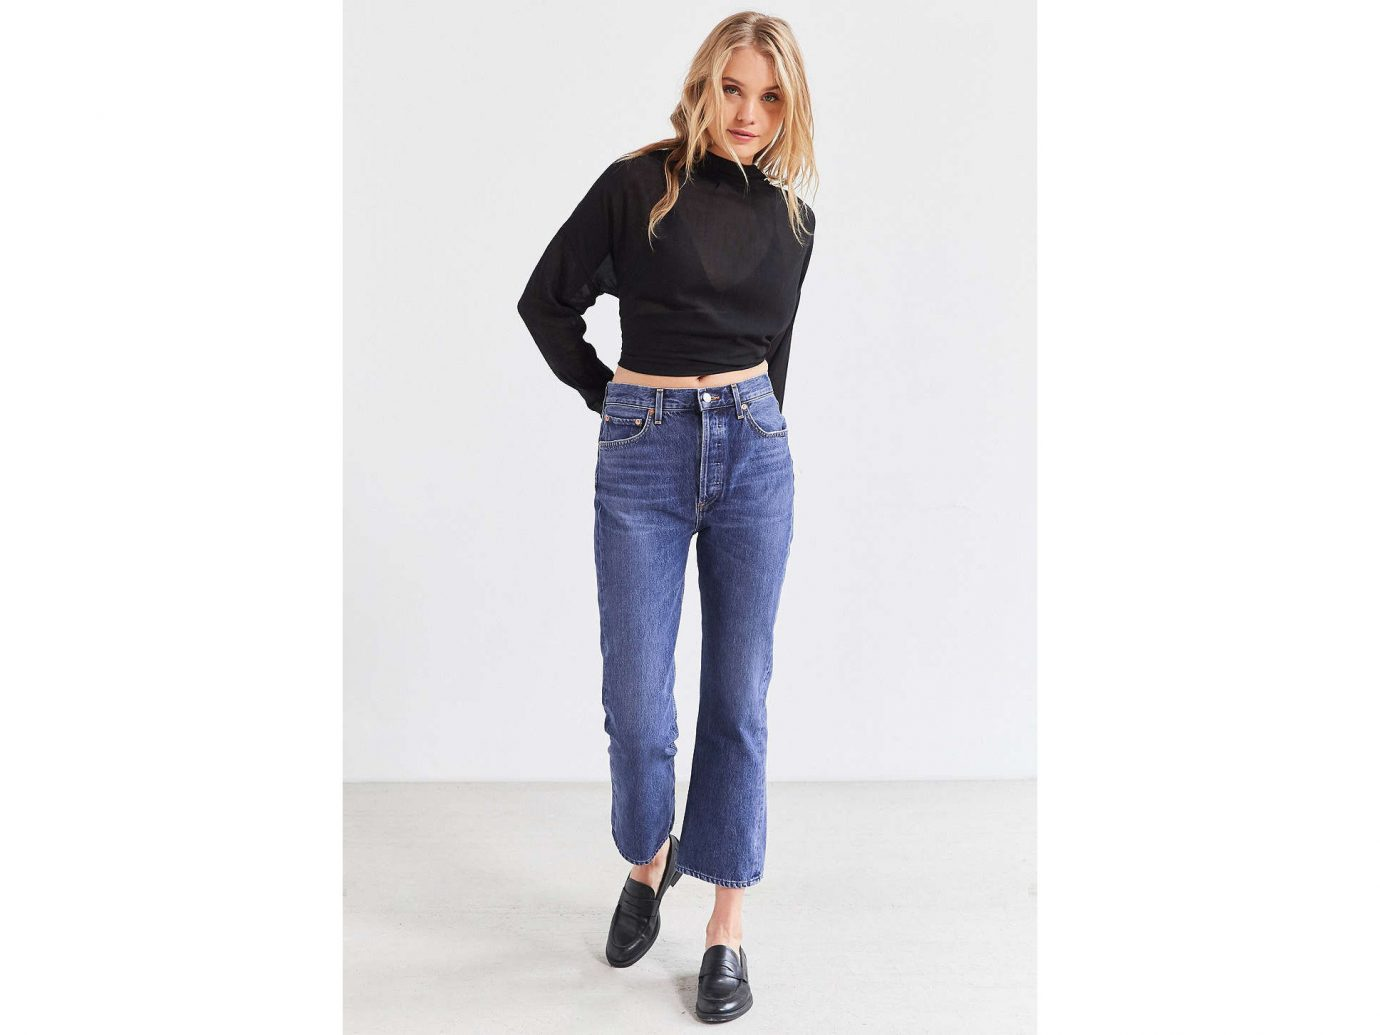 Style + Design jeans clothing person waist denim fashion model shoulder standing trousers joint trunk abdomen electric blue one piece garment pocket neck trouser colored